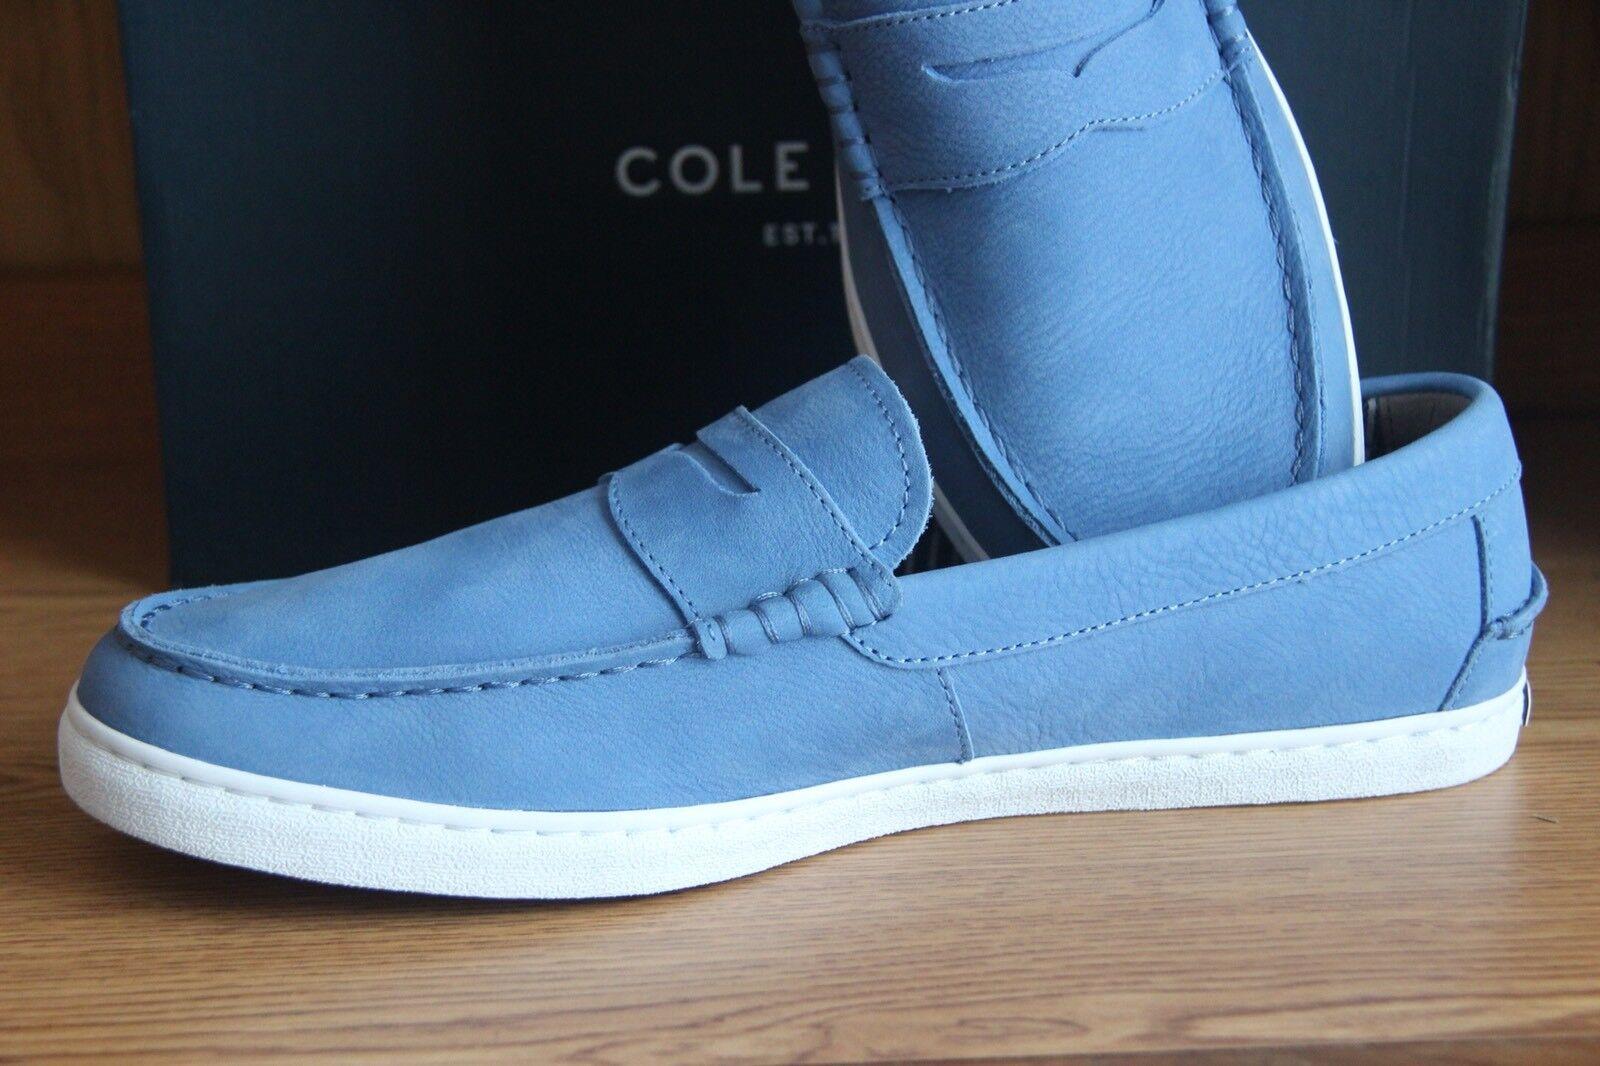 Cole Haan Nantucket Loafer Riverside Riverside Riverside blu Men Dimensione 11.5 C27891 54b80c